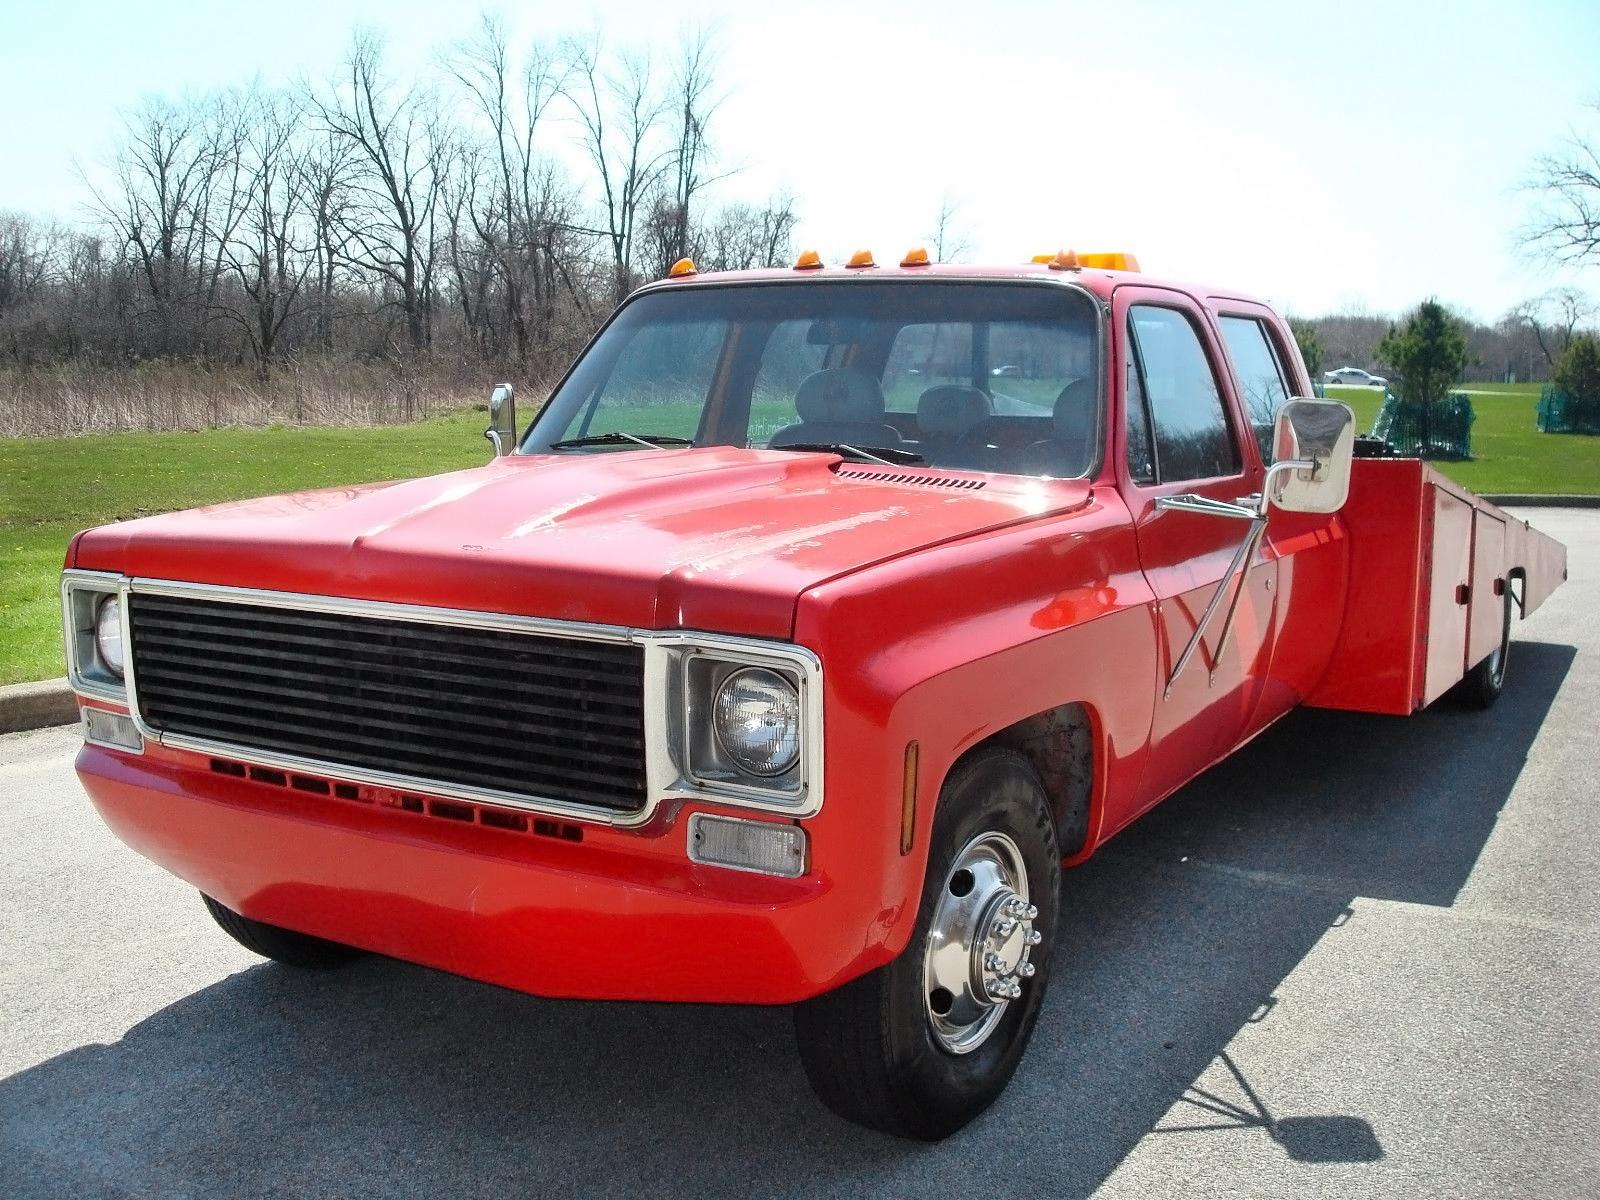 Long Hauler: 1978 Chevrolet C30 Car Hauler